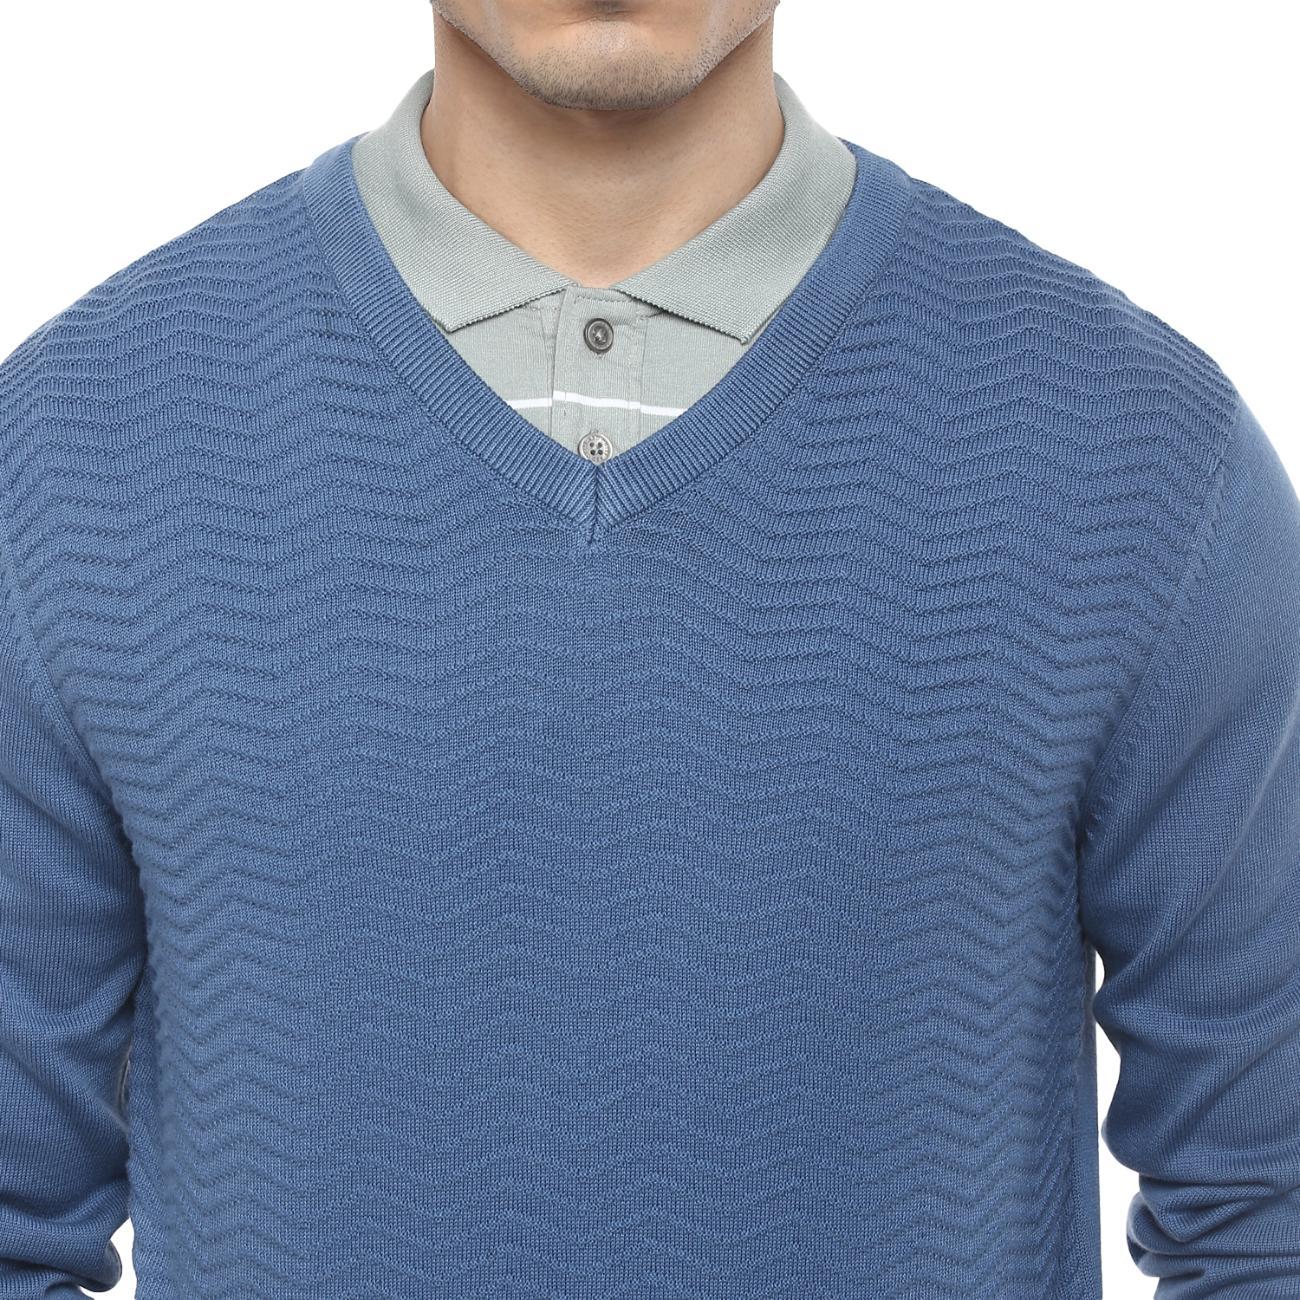 Buy Online Men's V-neck Blue Casual Sweater